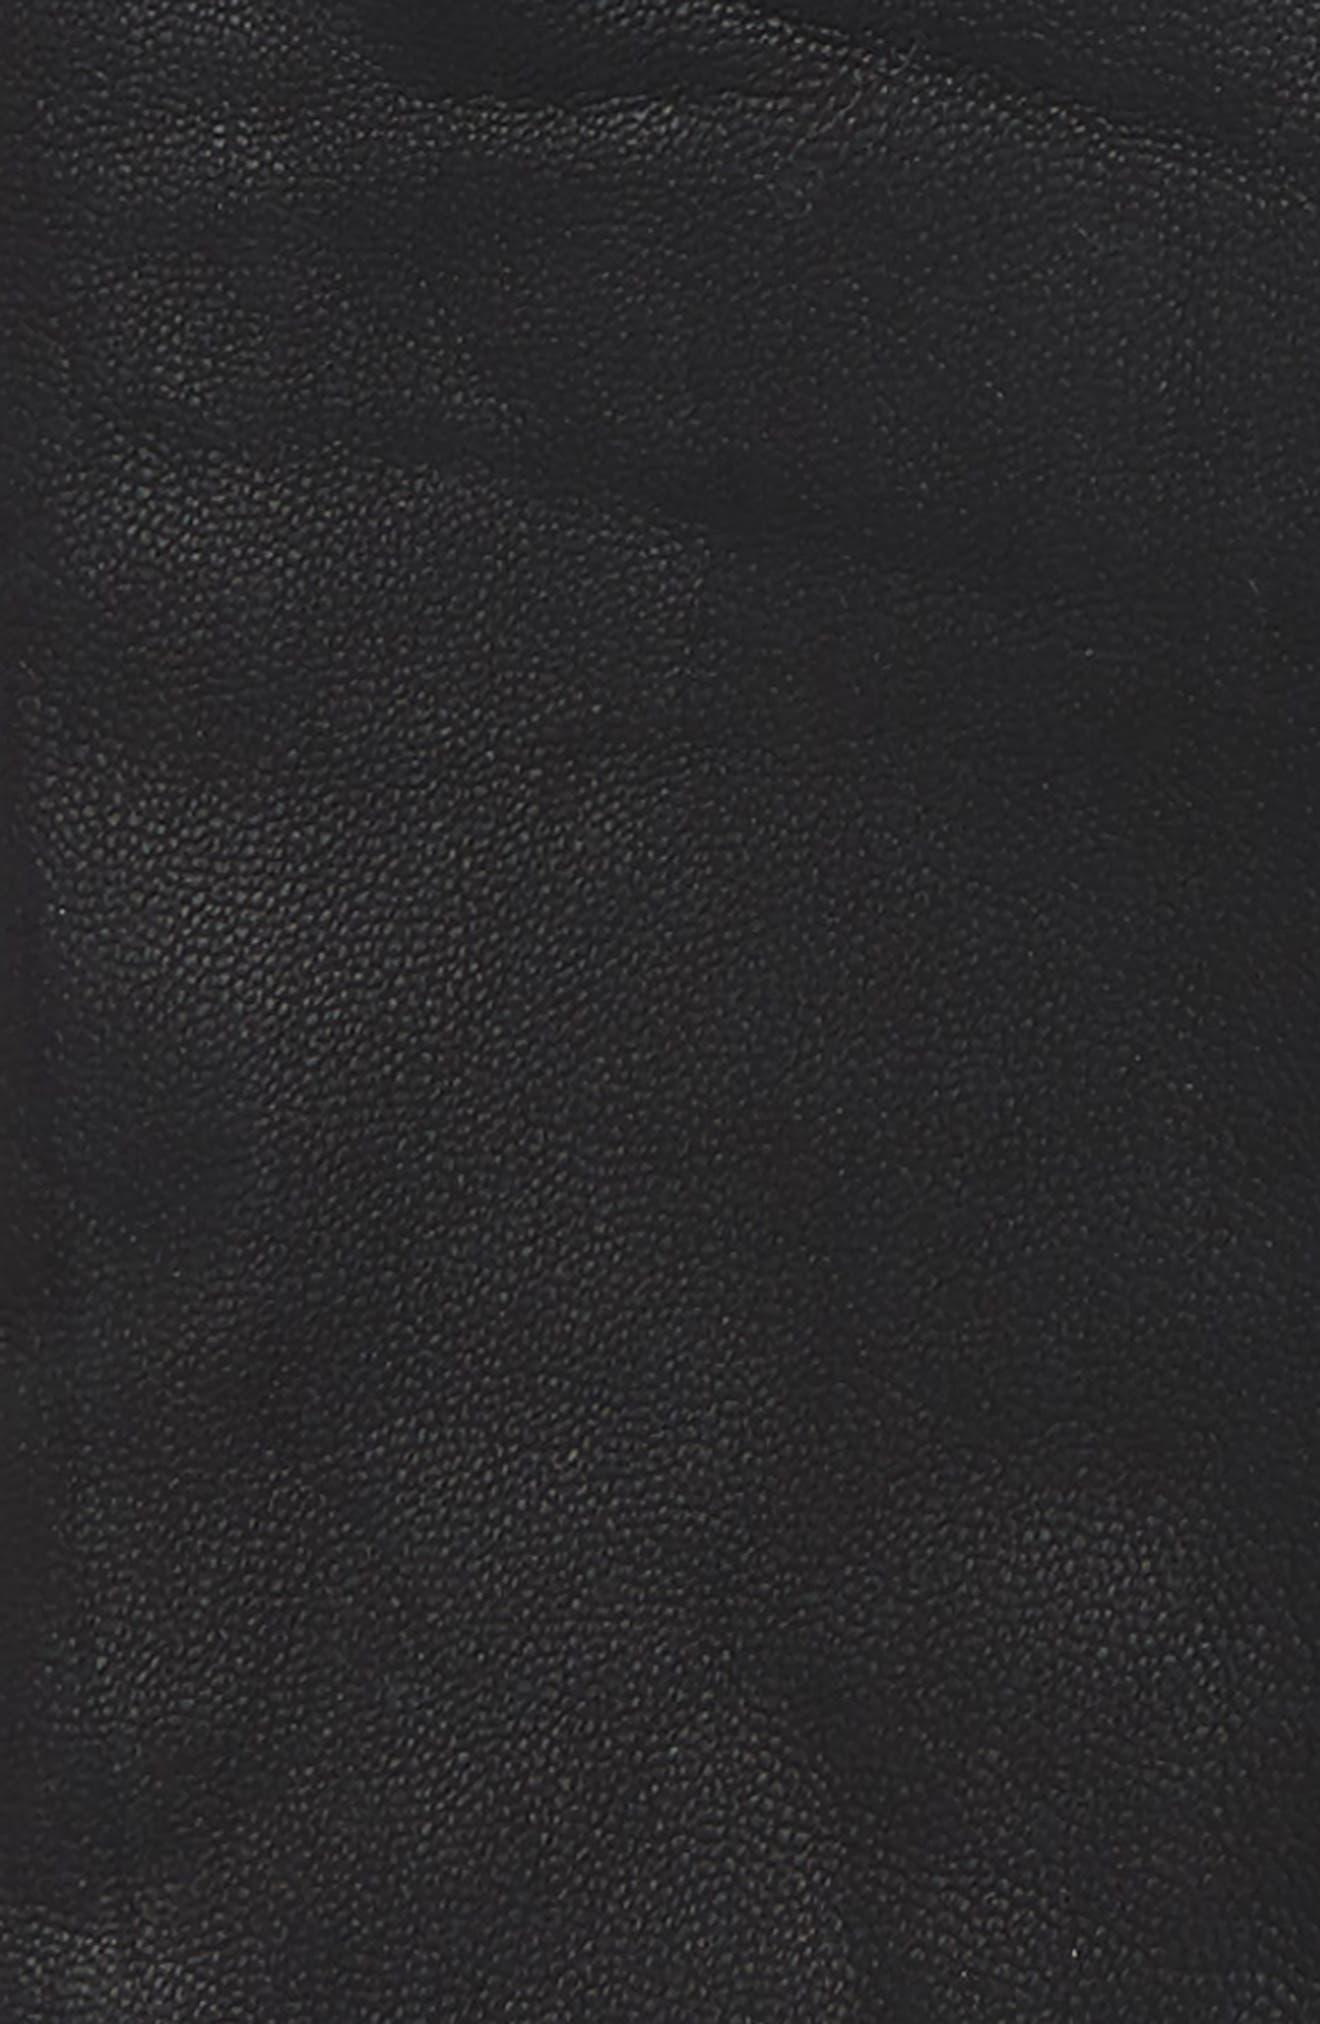 Kanton Leather Gloves,                             Alternate thumbnail 2, color,